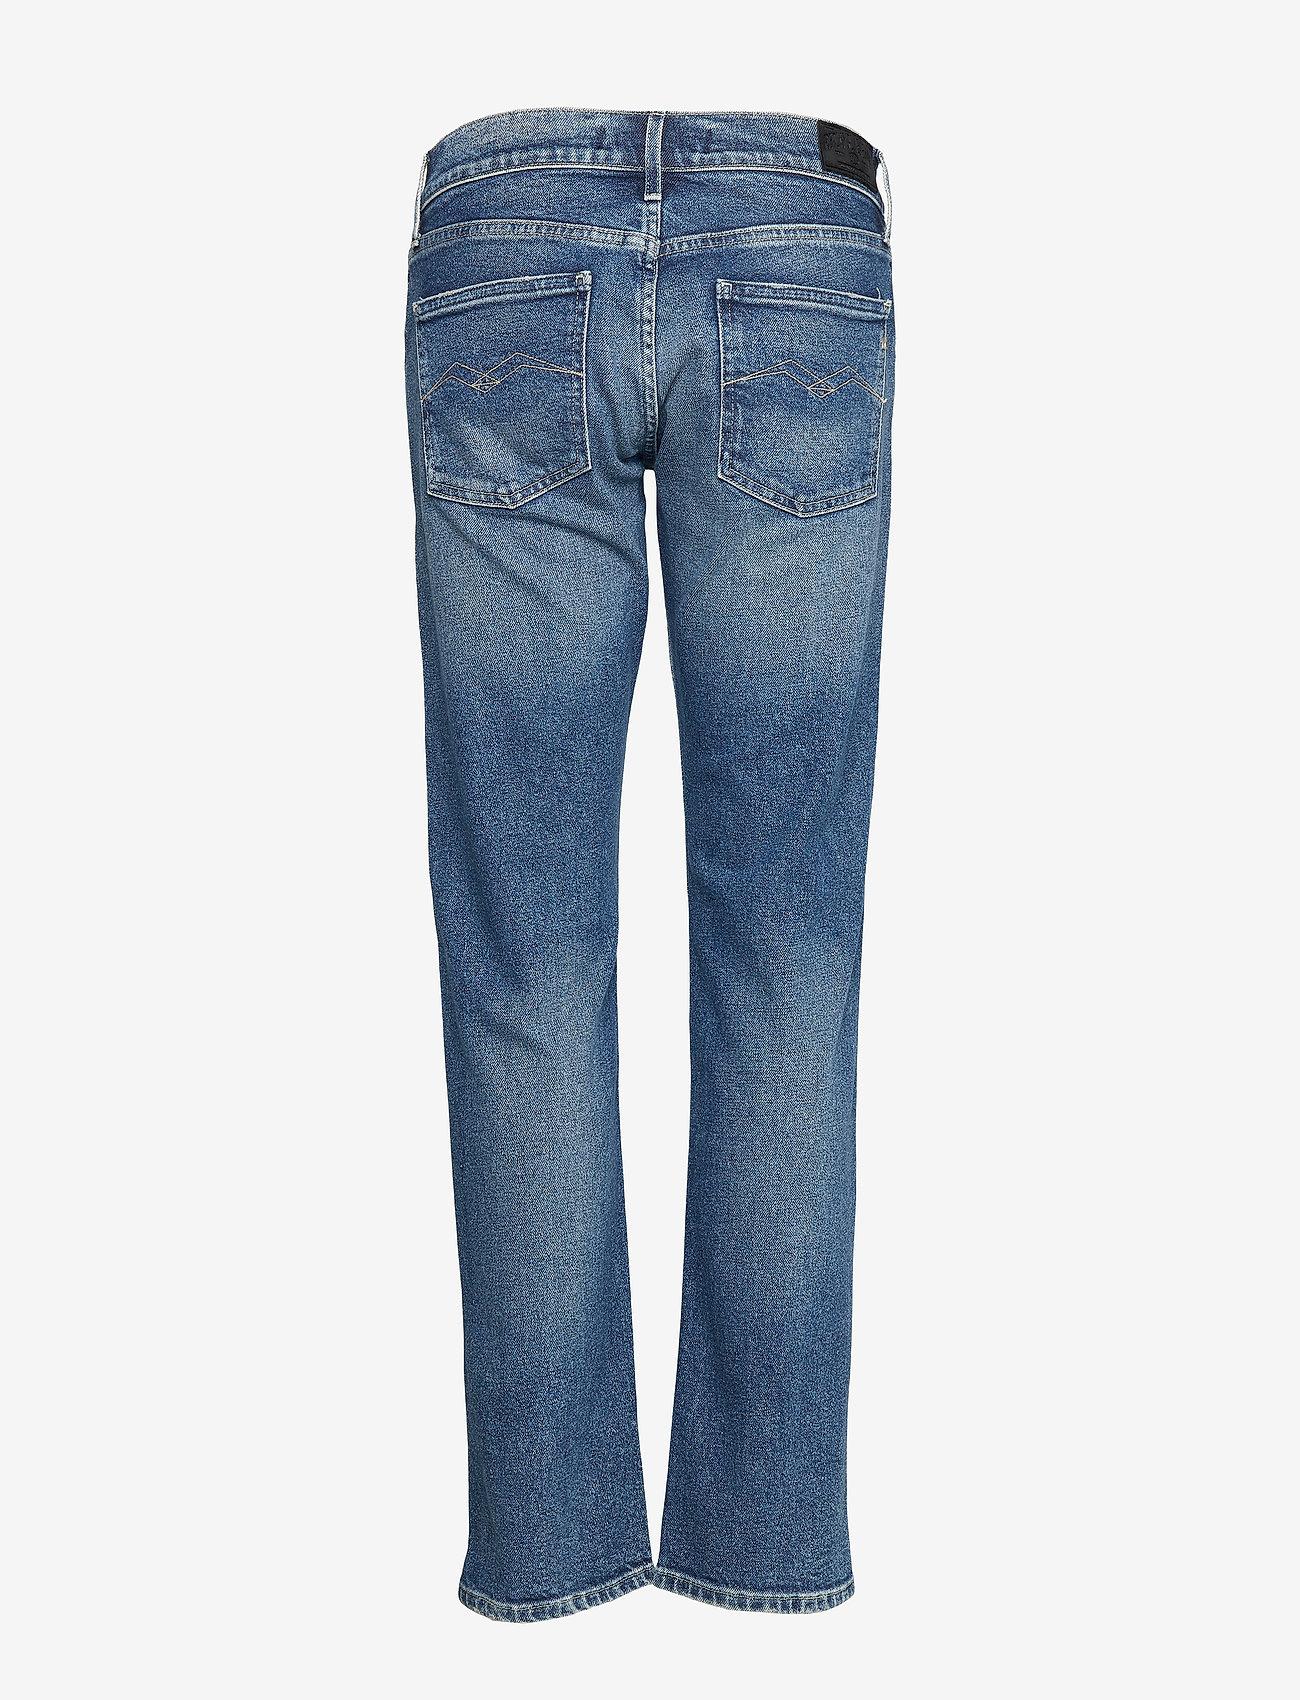 Replay - JOPLYN - straight jeans - medium blue - 1